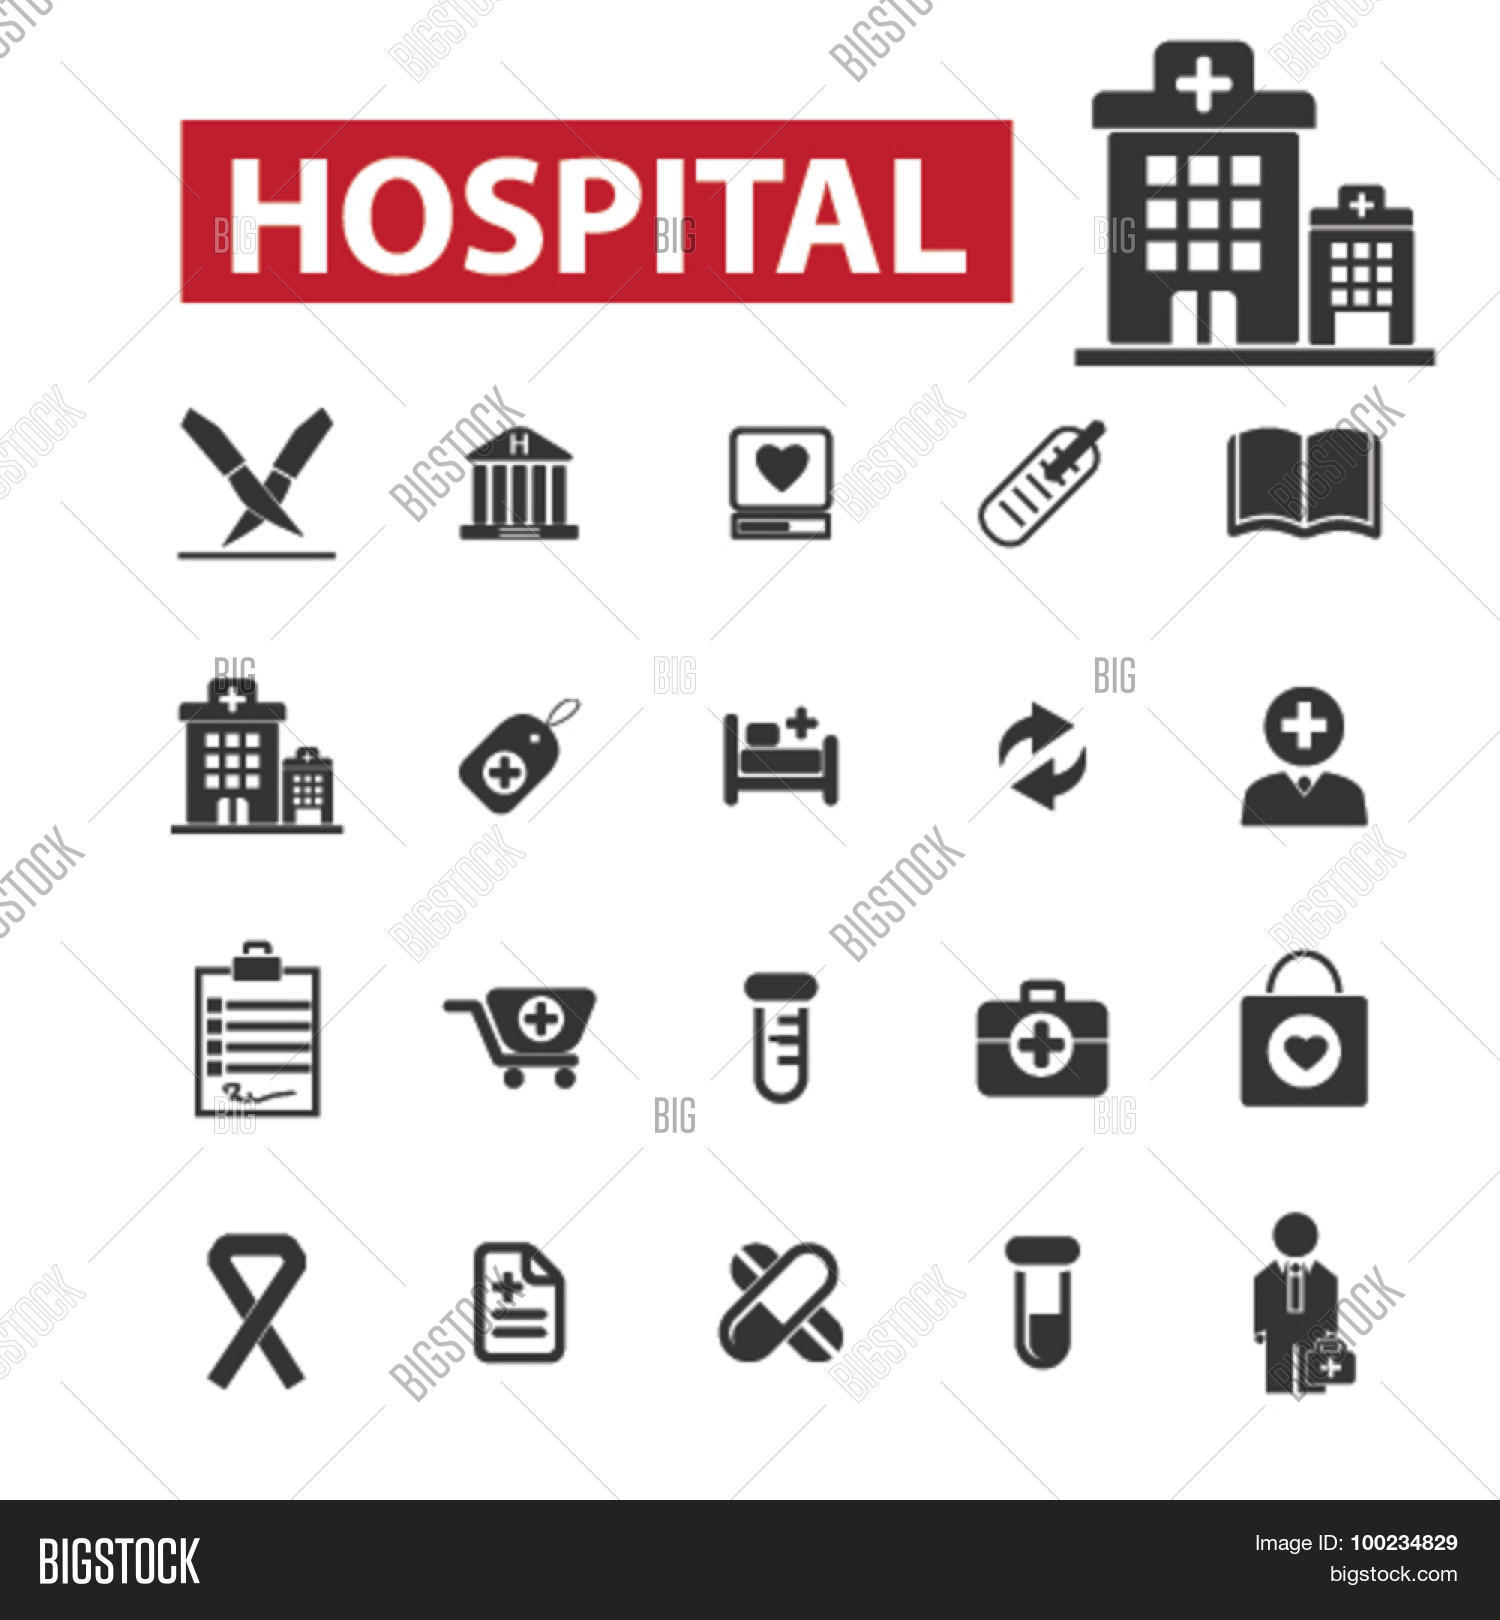 Hospital Black Vector & Photo (Free Trial) | Bigstock